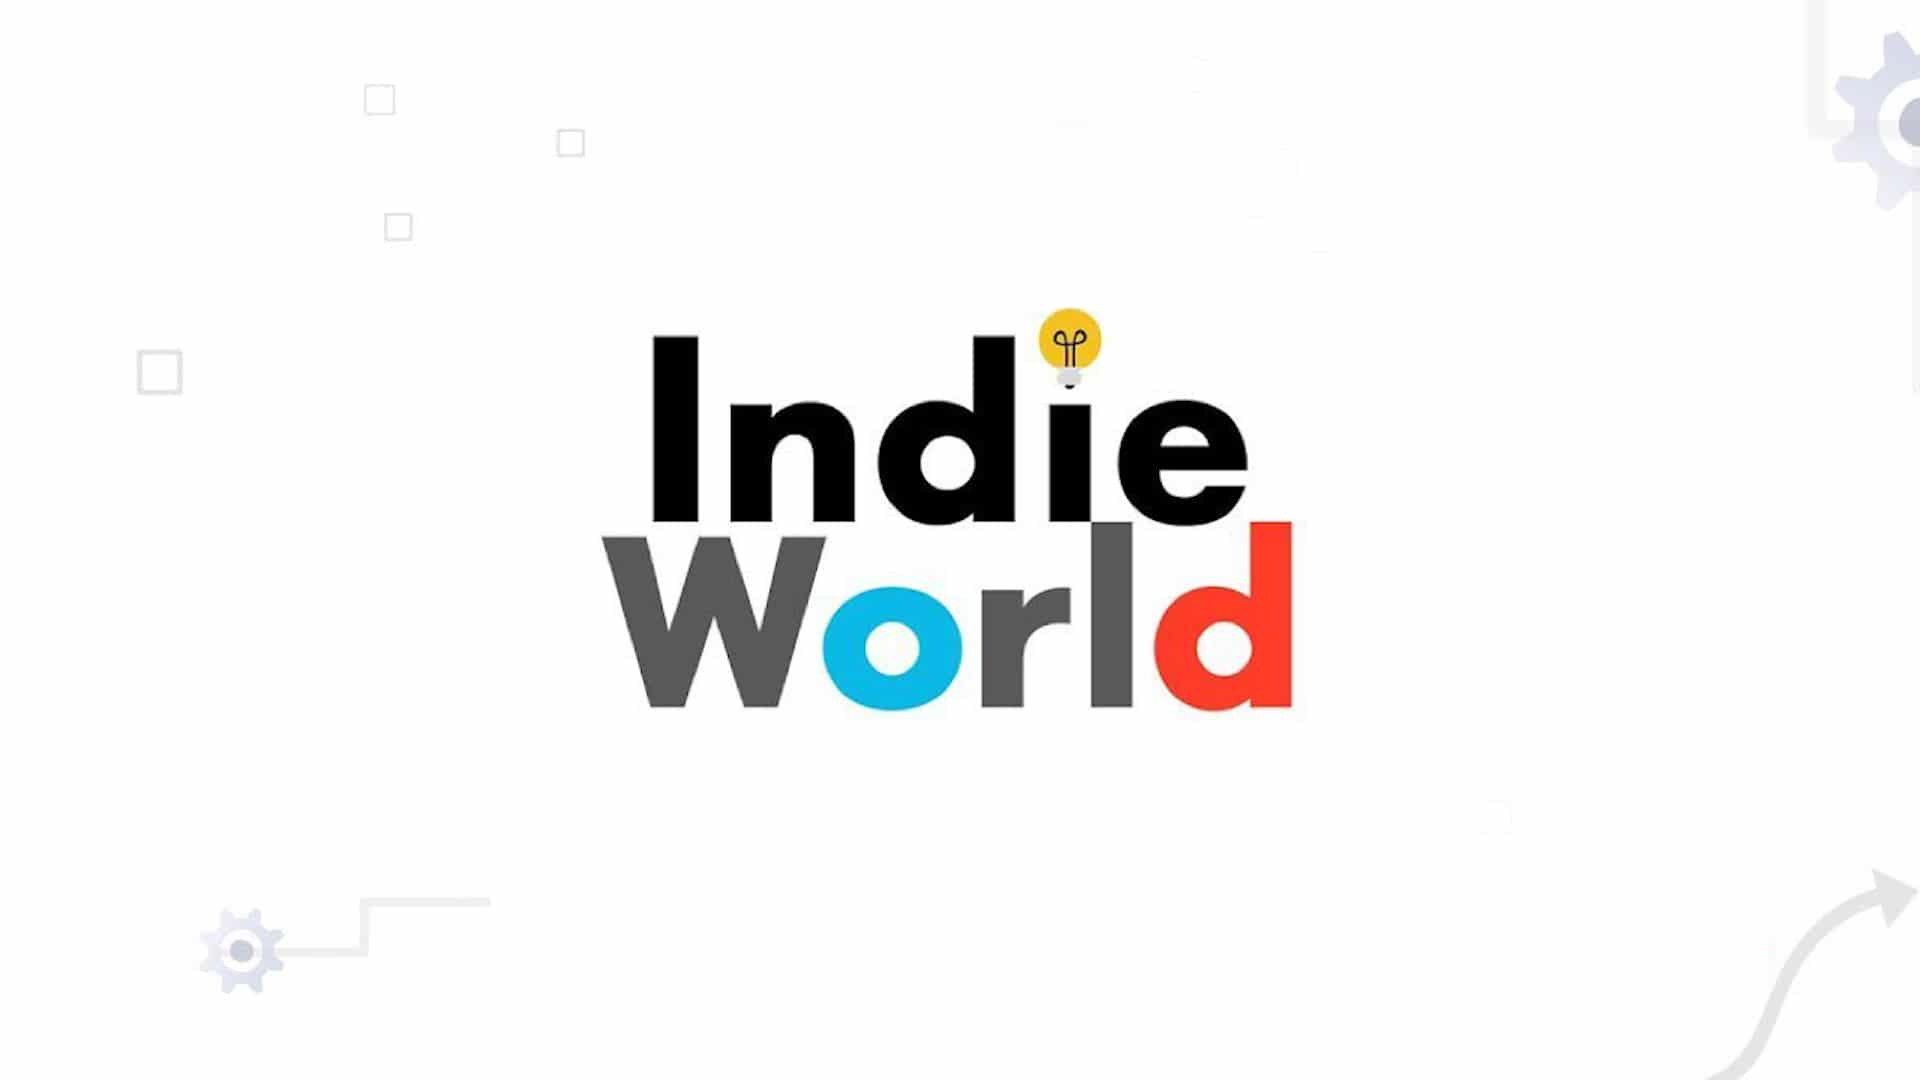 Indie World - Nintendo en indé